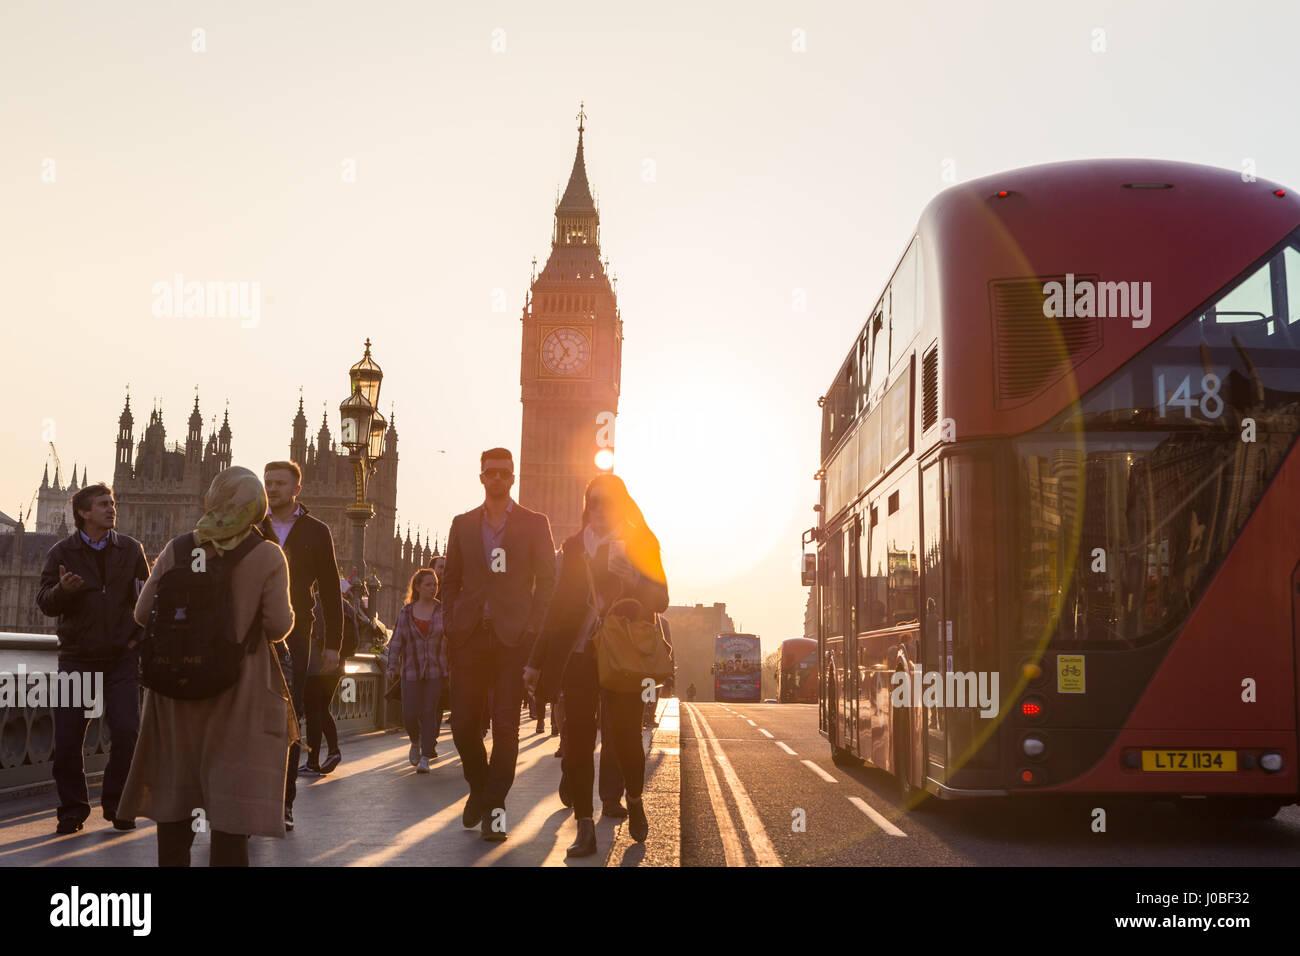 Traffic and random people on Westminster Bridge in sunset, London, UK. - Stock Image